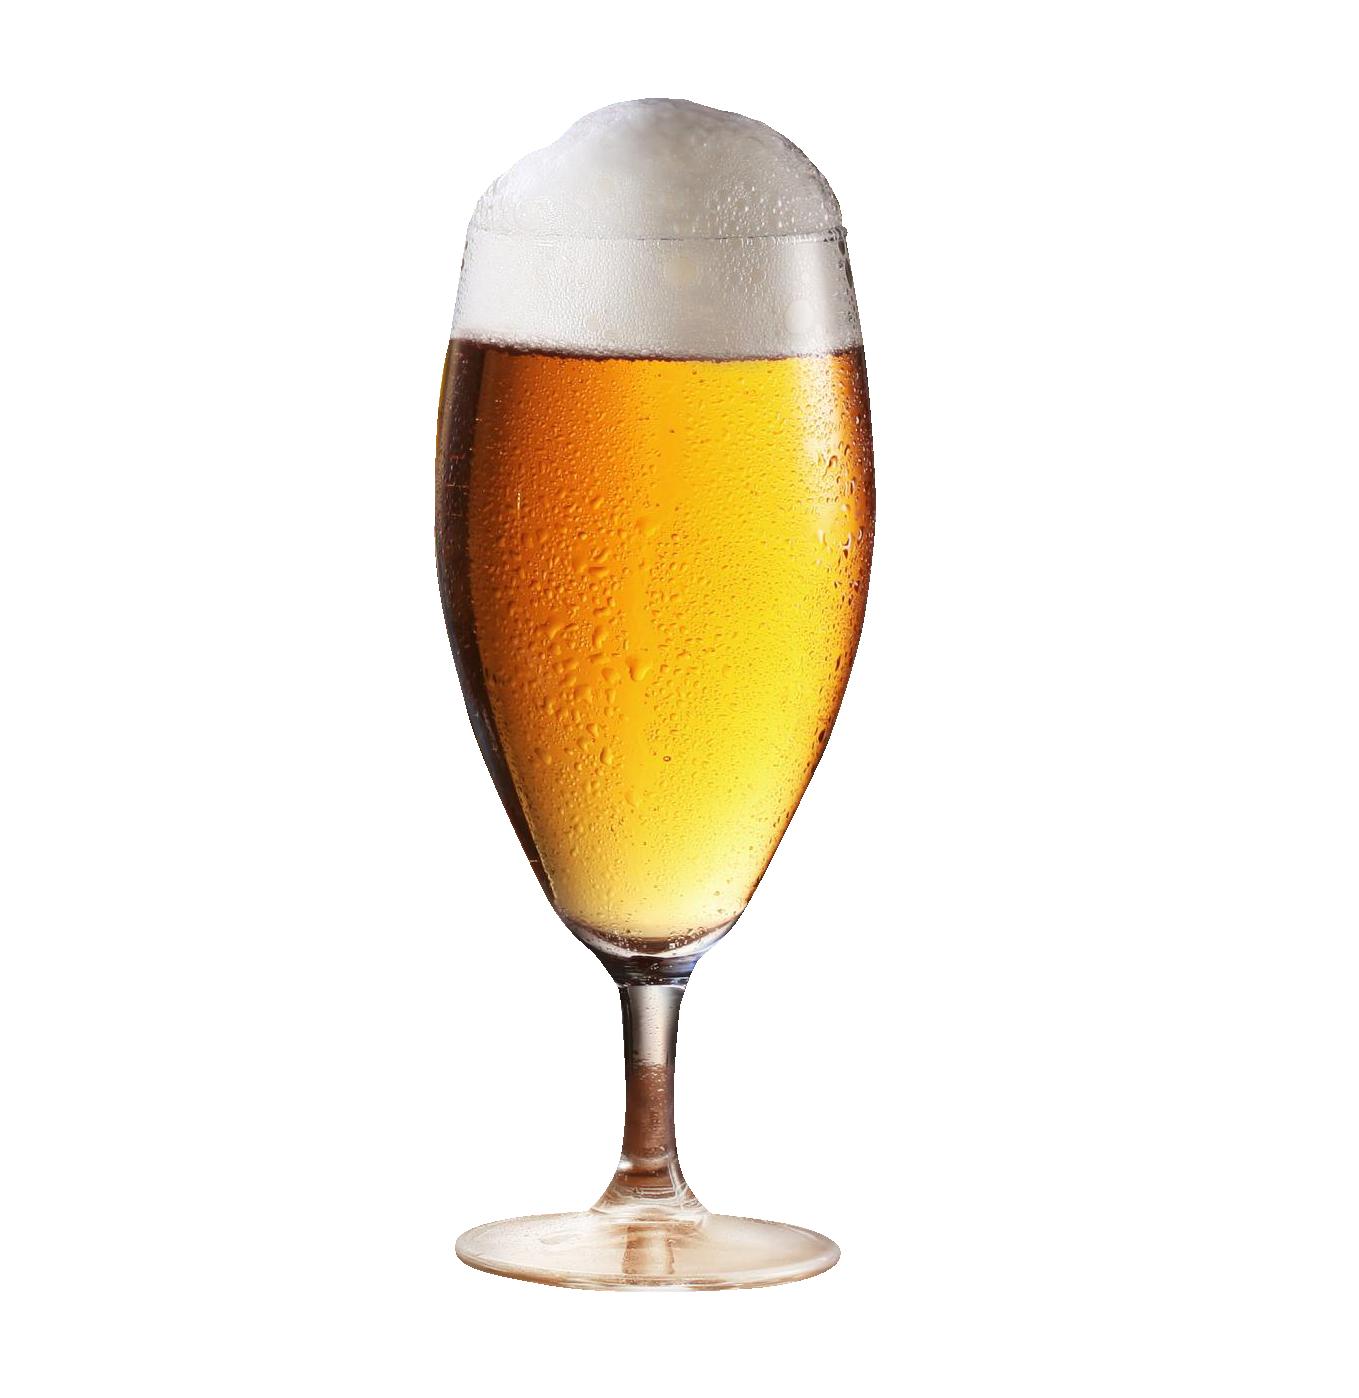 Alcohol png images pngpix. Cocktail clipart prosecco